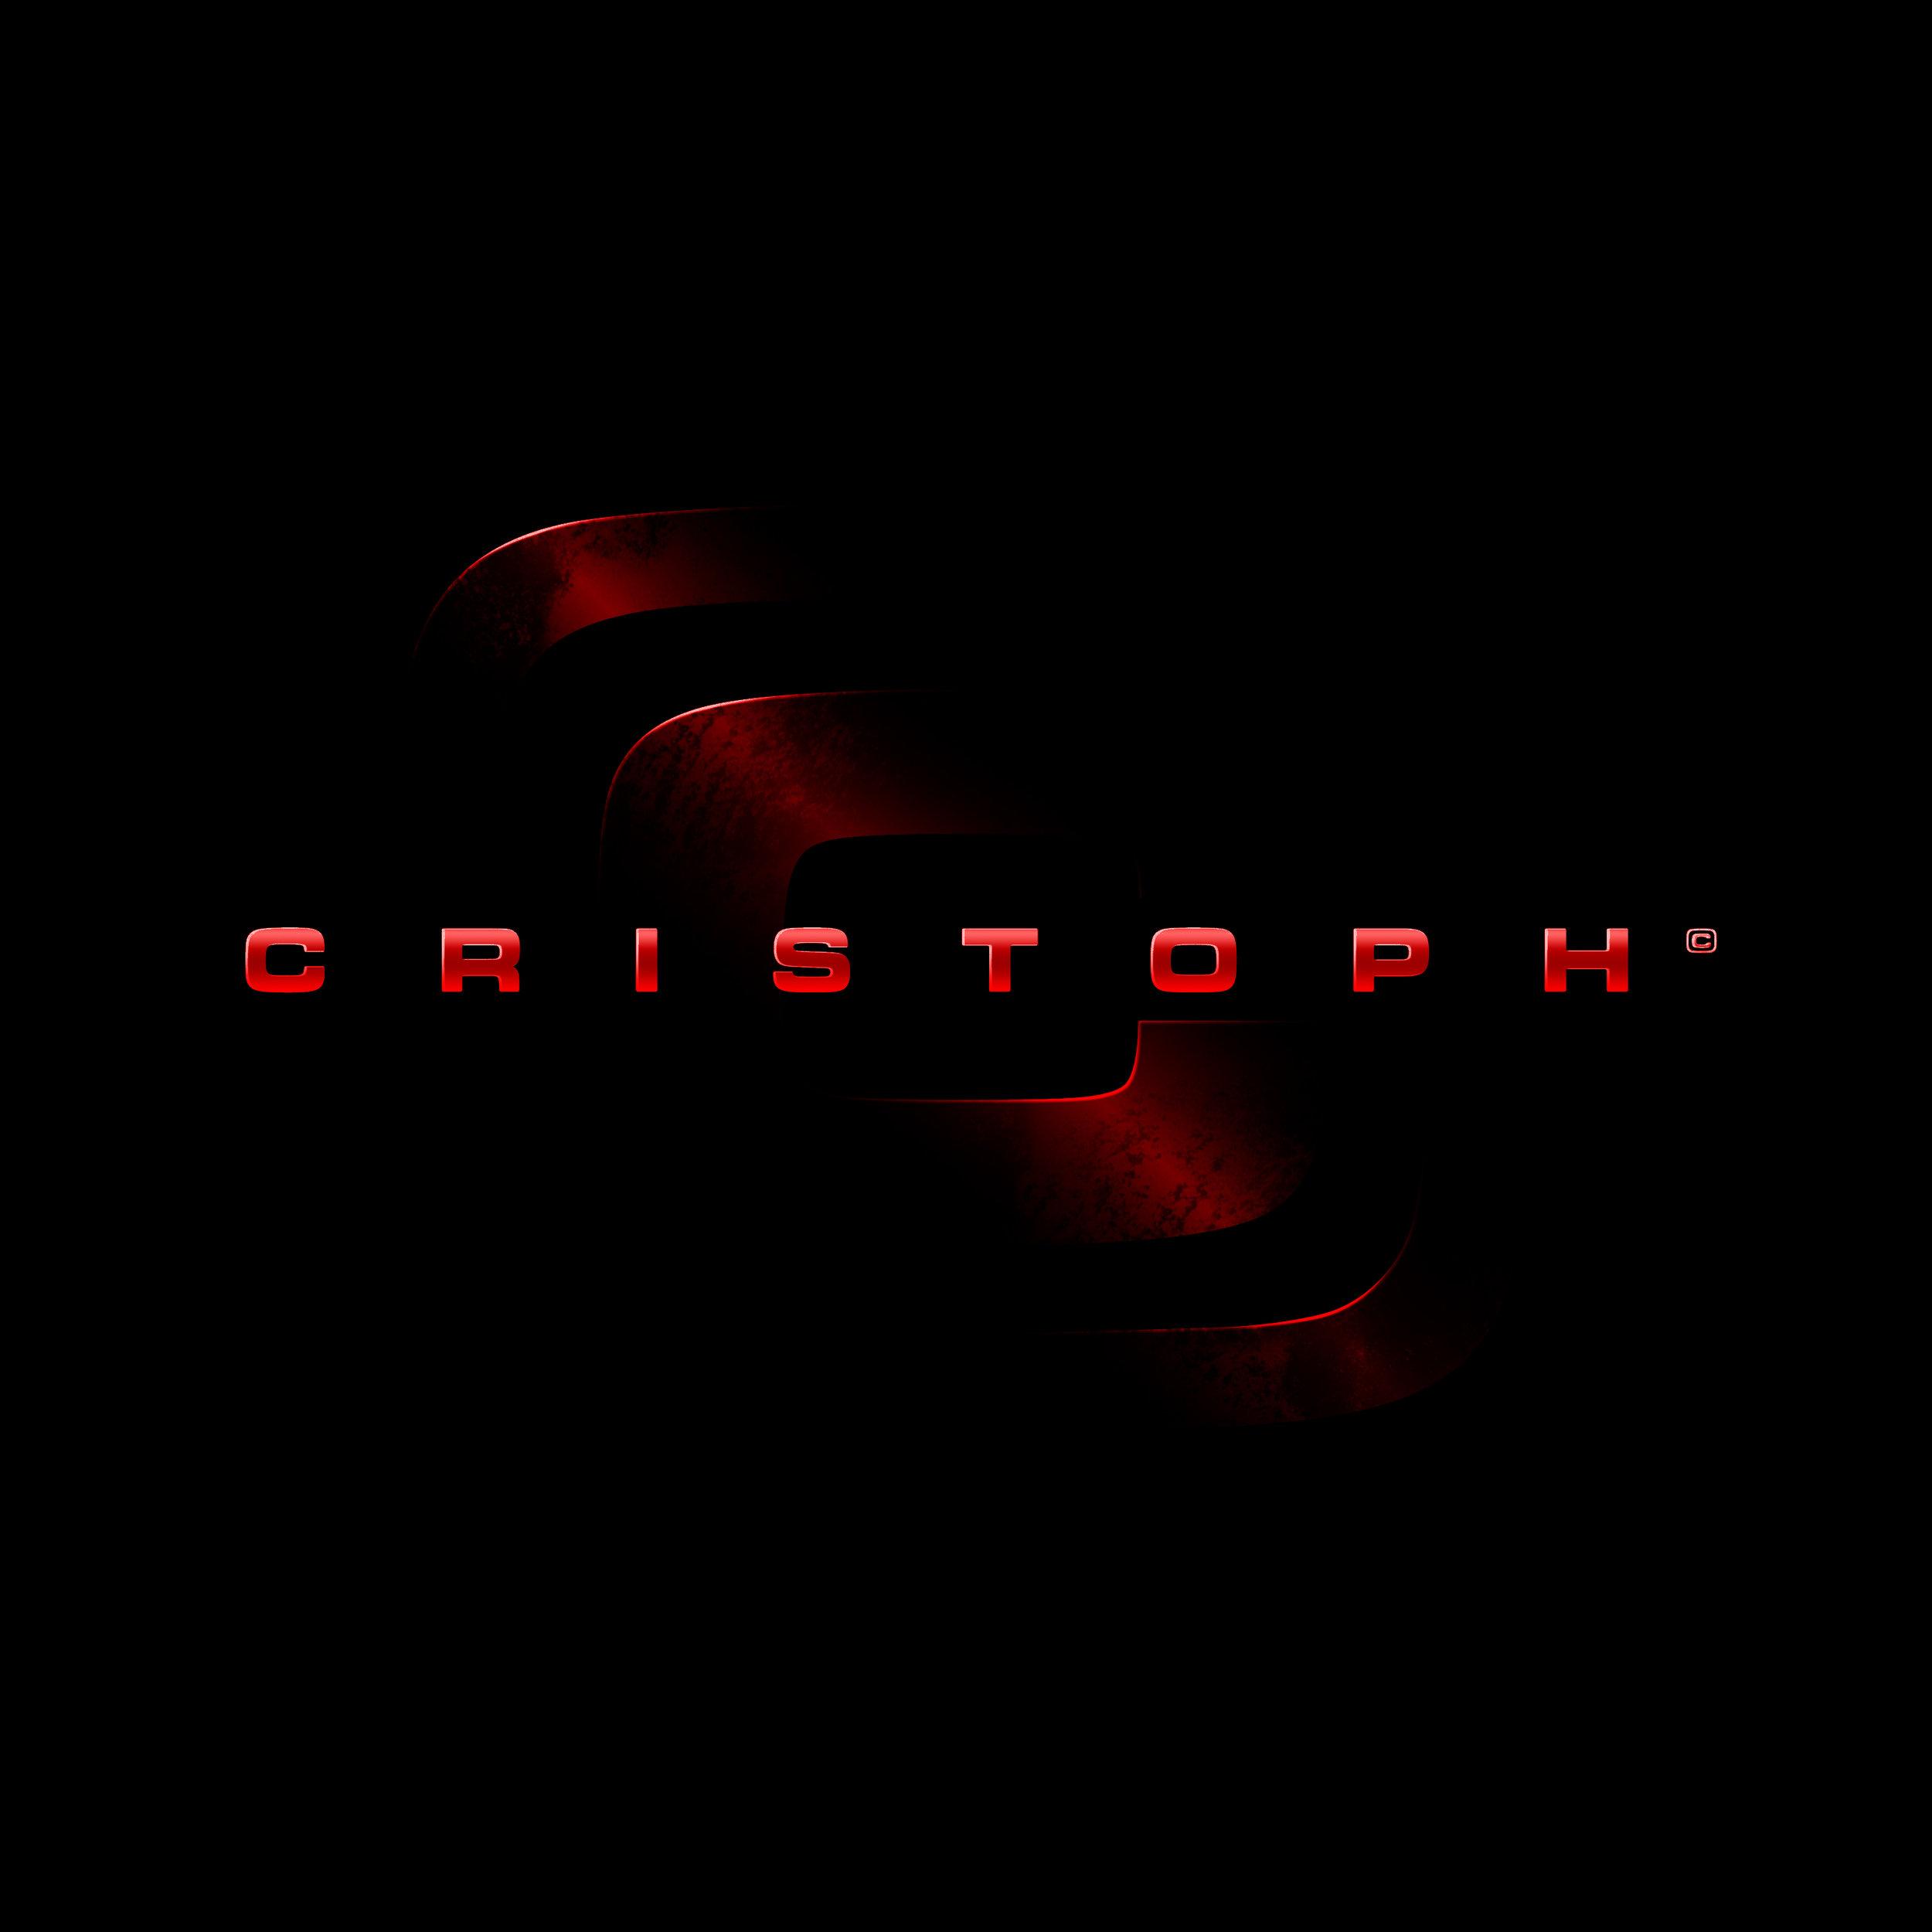 Feel<br/><b>Cristoph</b>